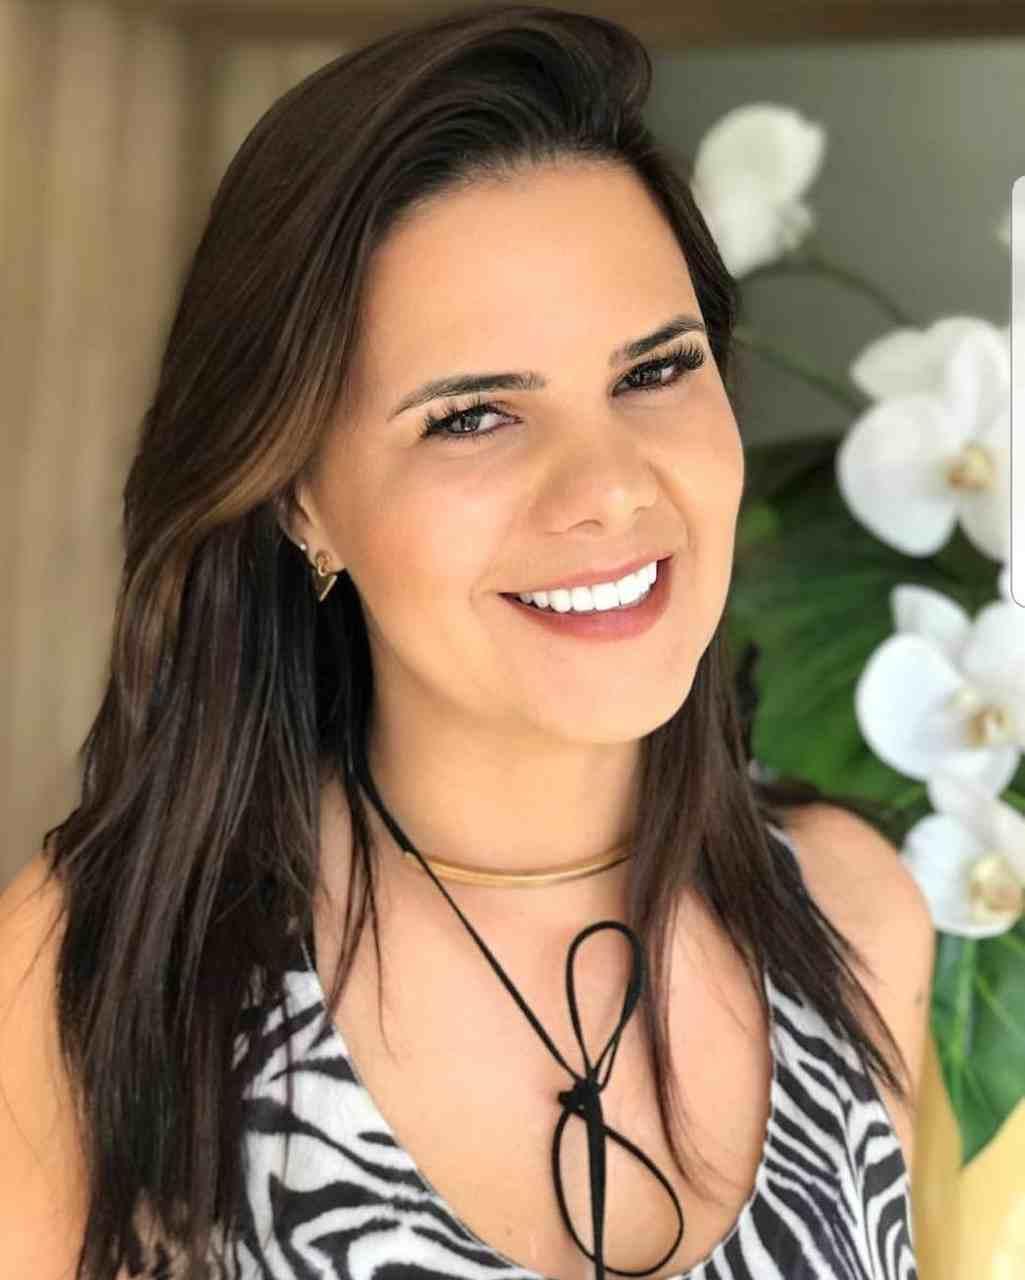 Esteticista Fernanda Silveira